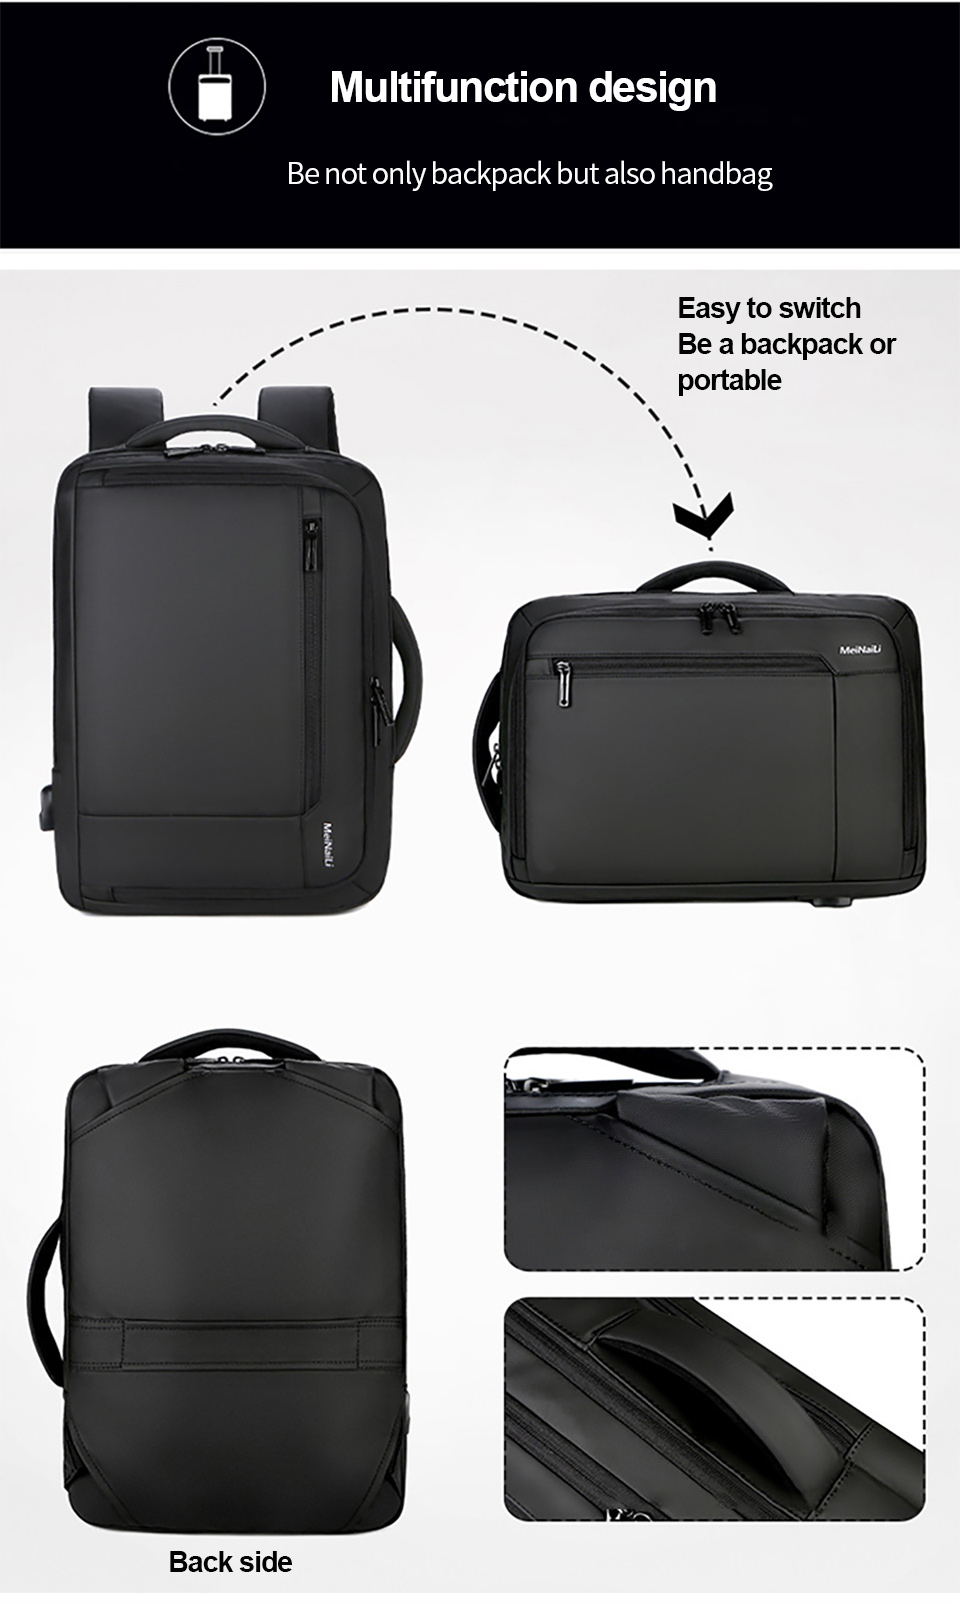 7 Multifunction USB Backpack Man Bag 15.6inch Laptop Backpacks Travel Bags Large Capacity Luggage Backpacking Waterproof Notebook